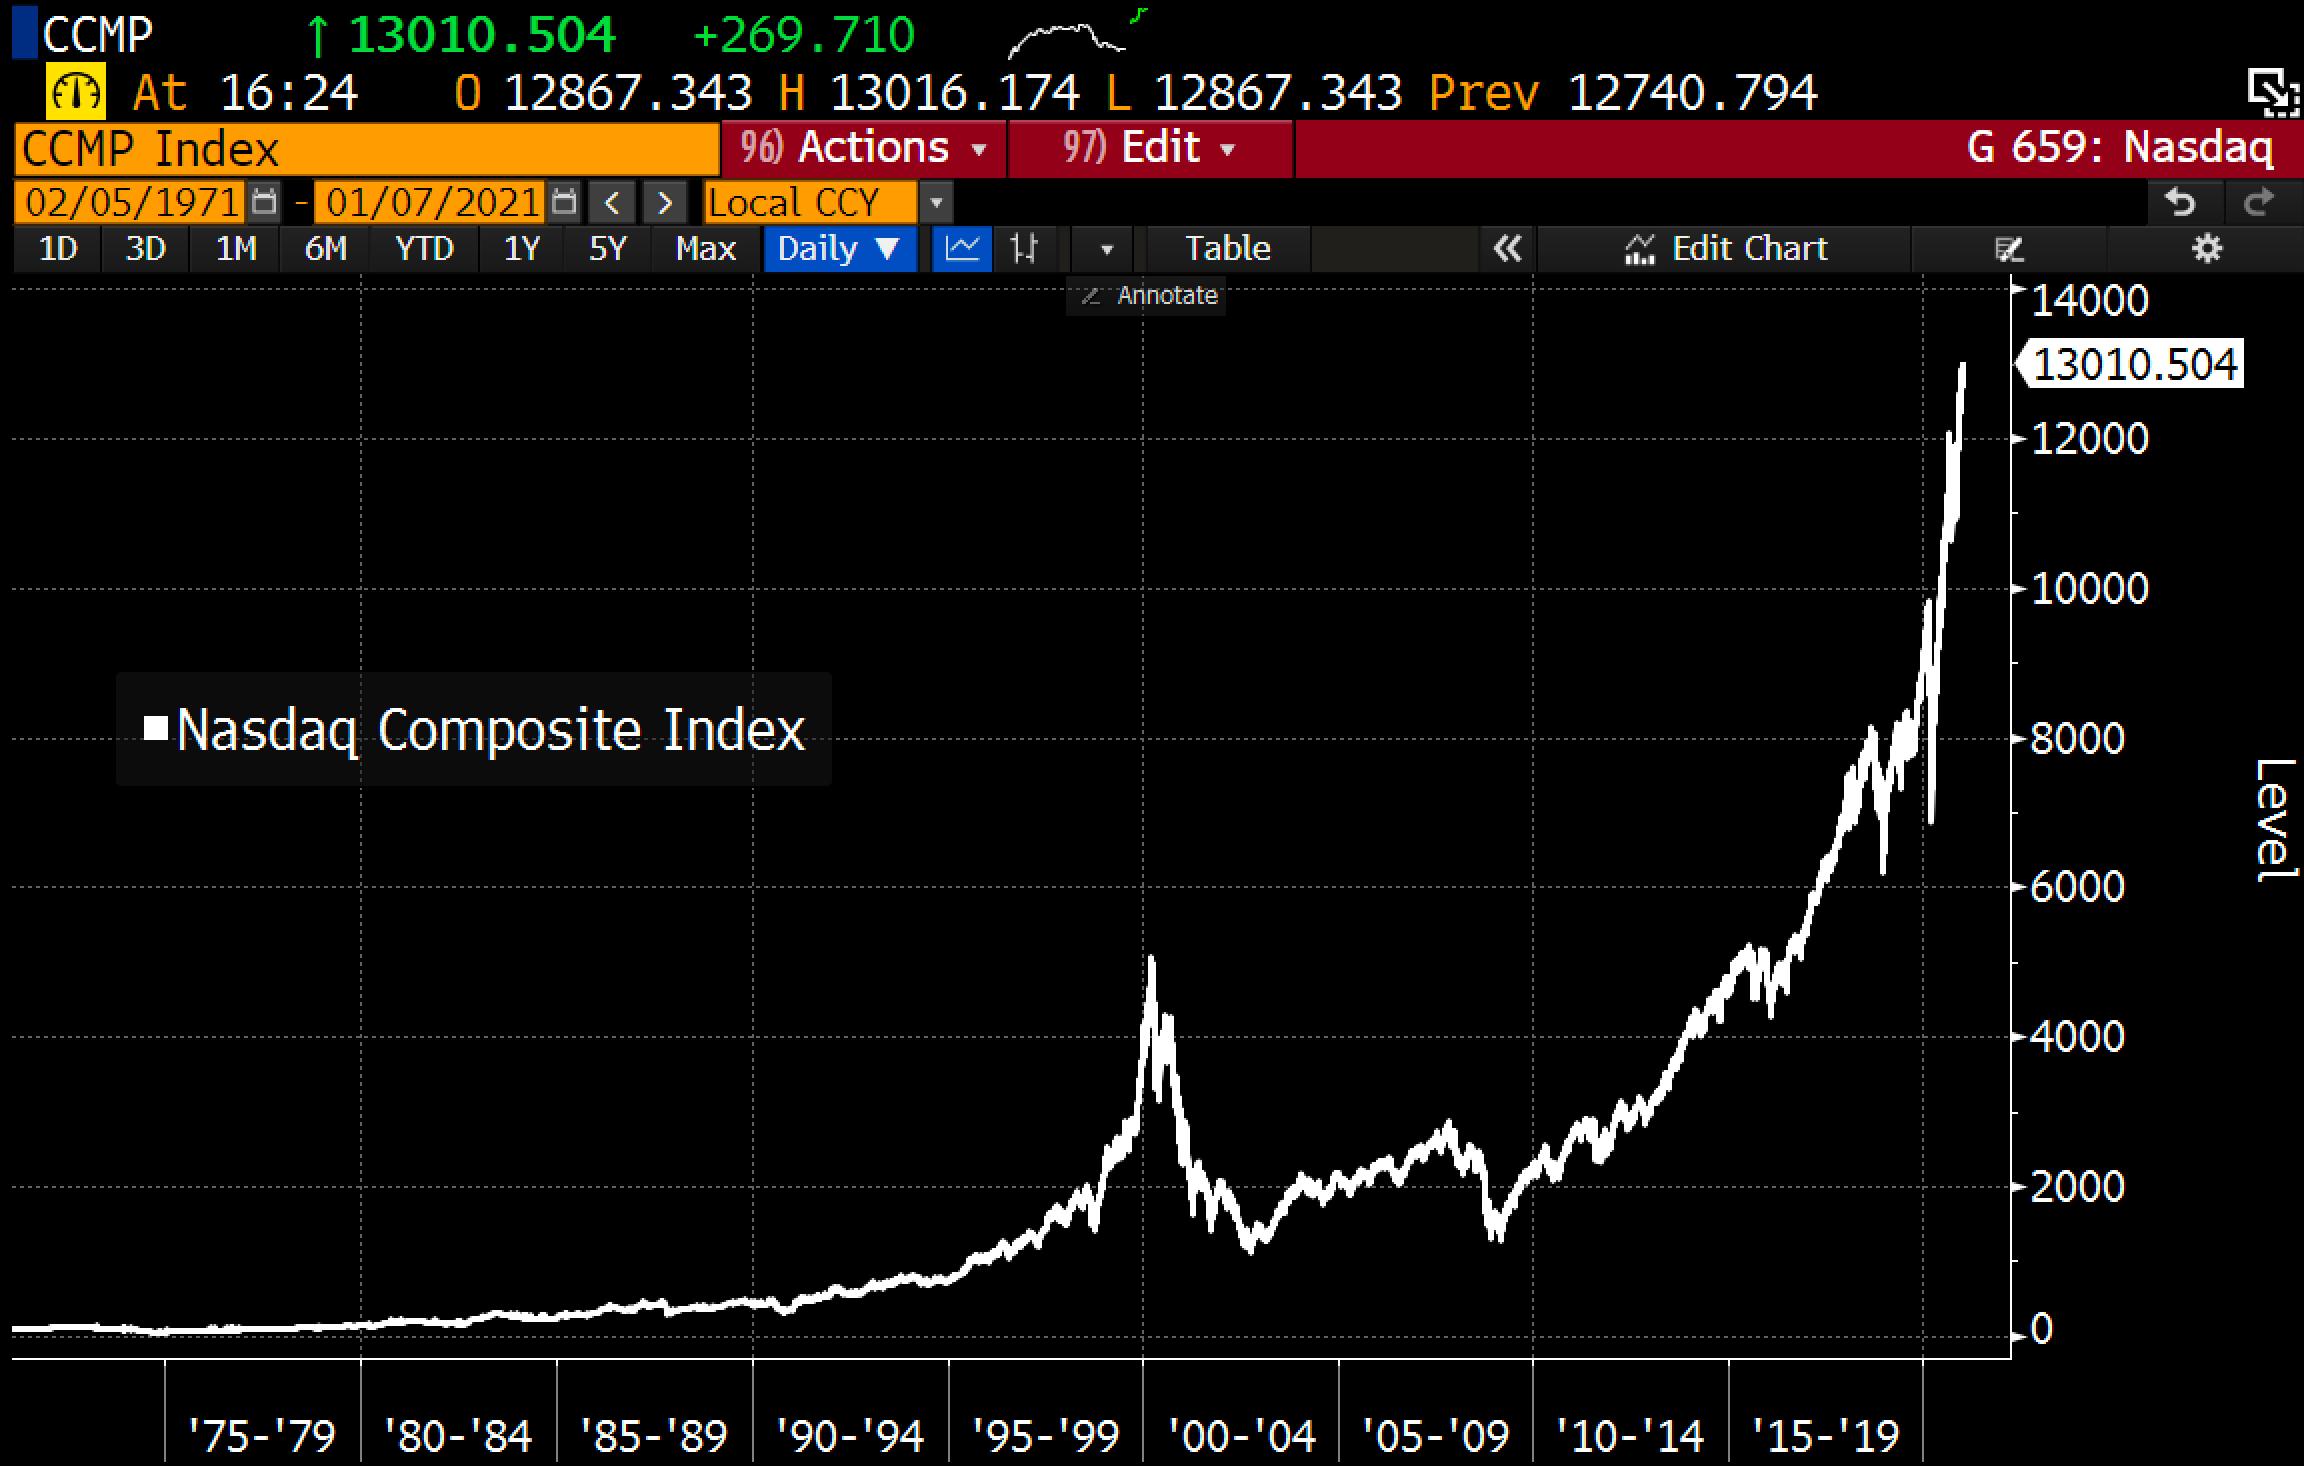 IMAGE - Nasdaq stock bubble 2021 SD Bullion